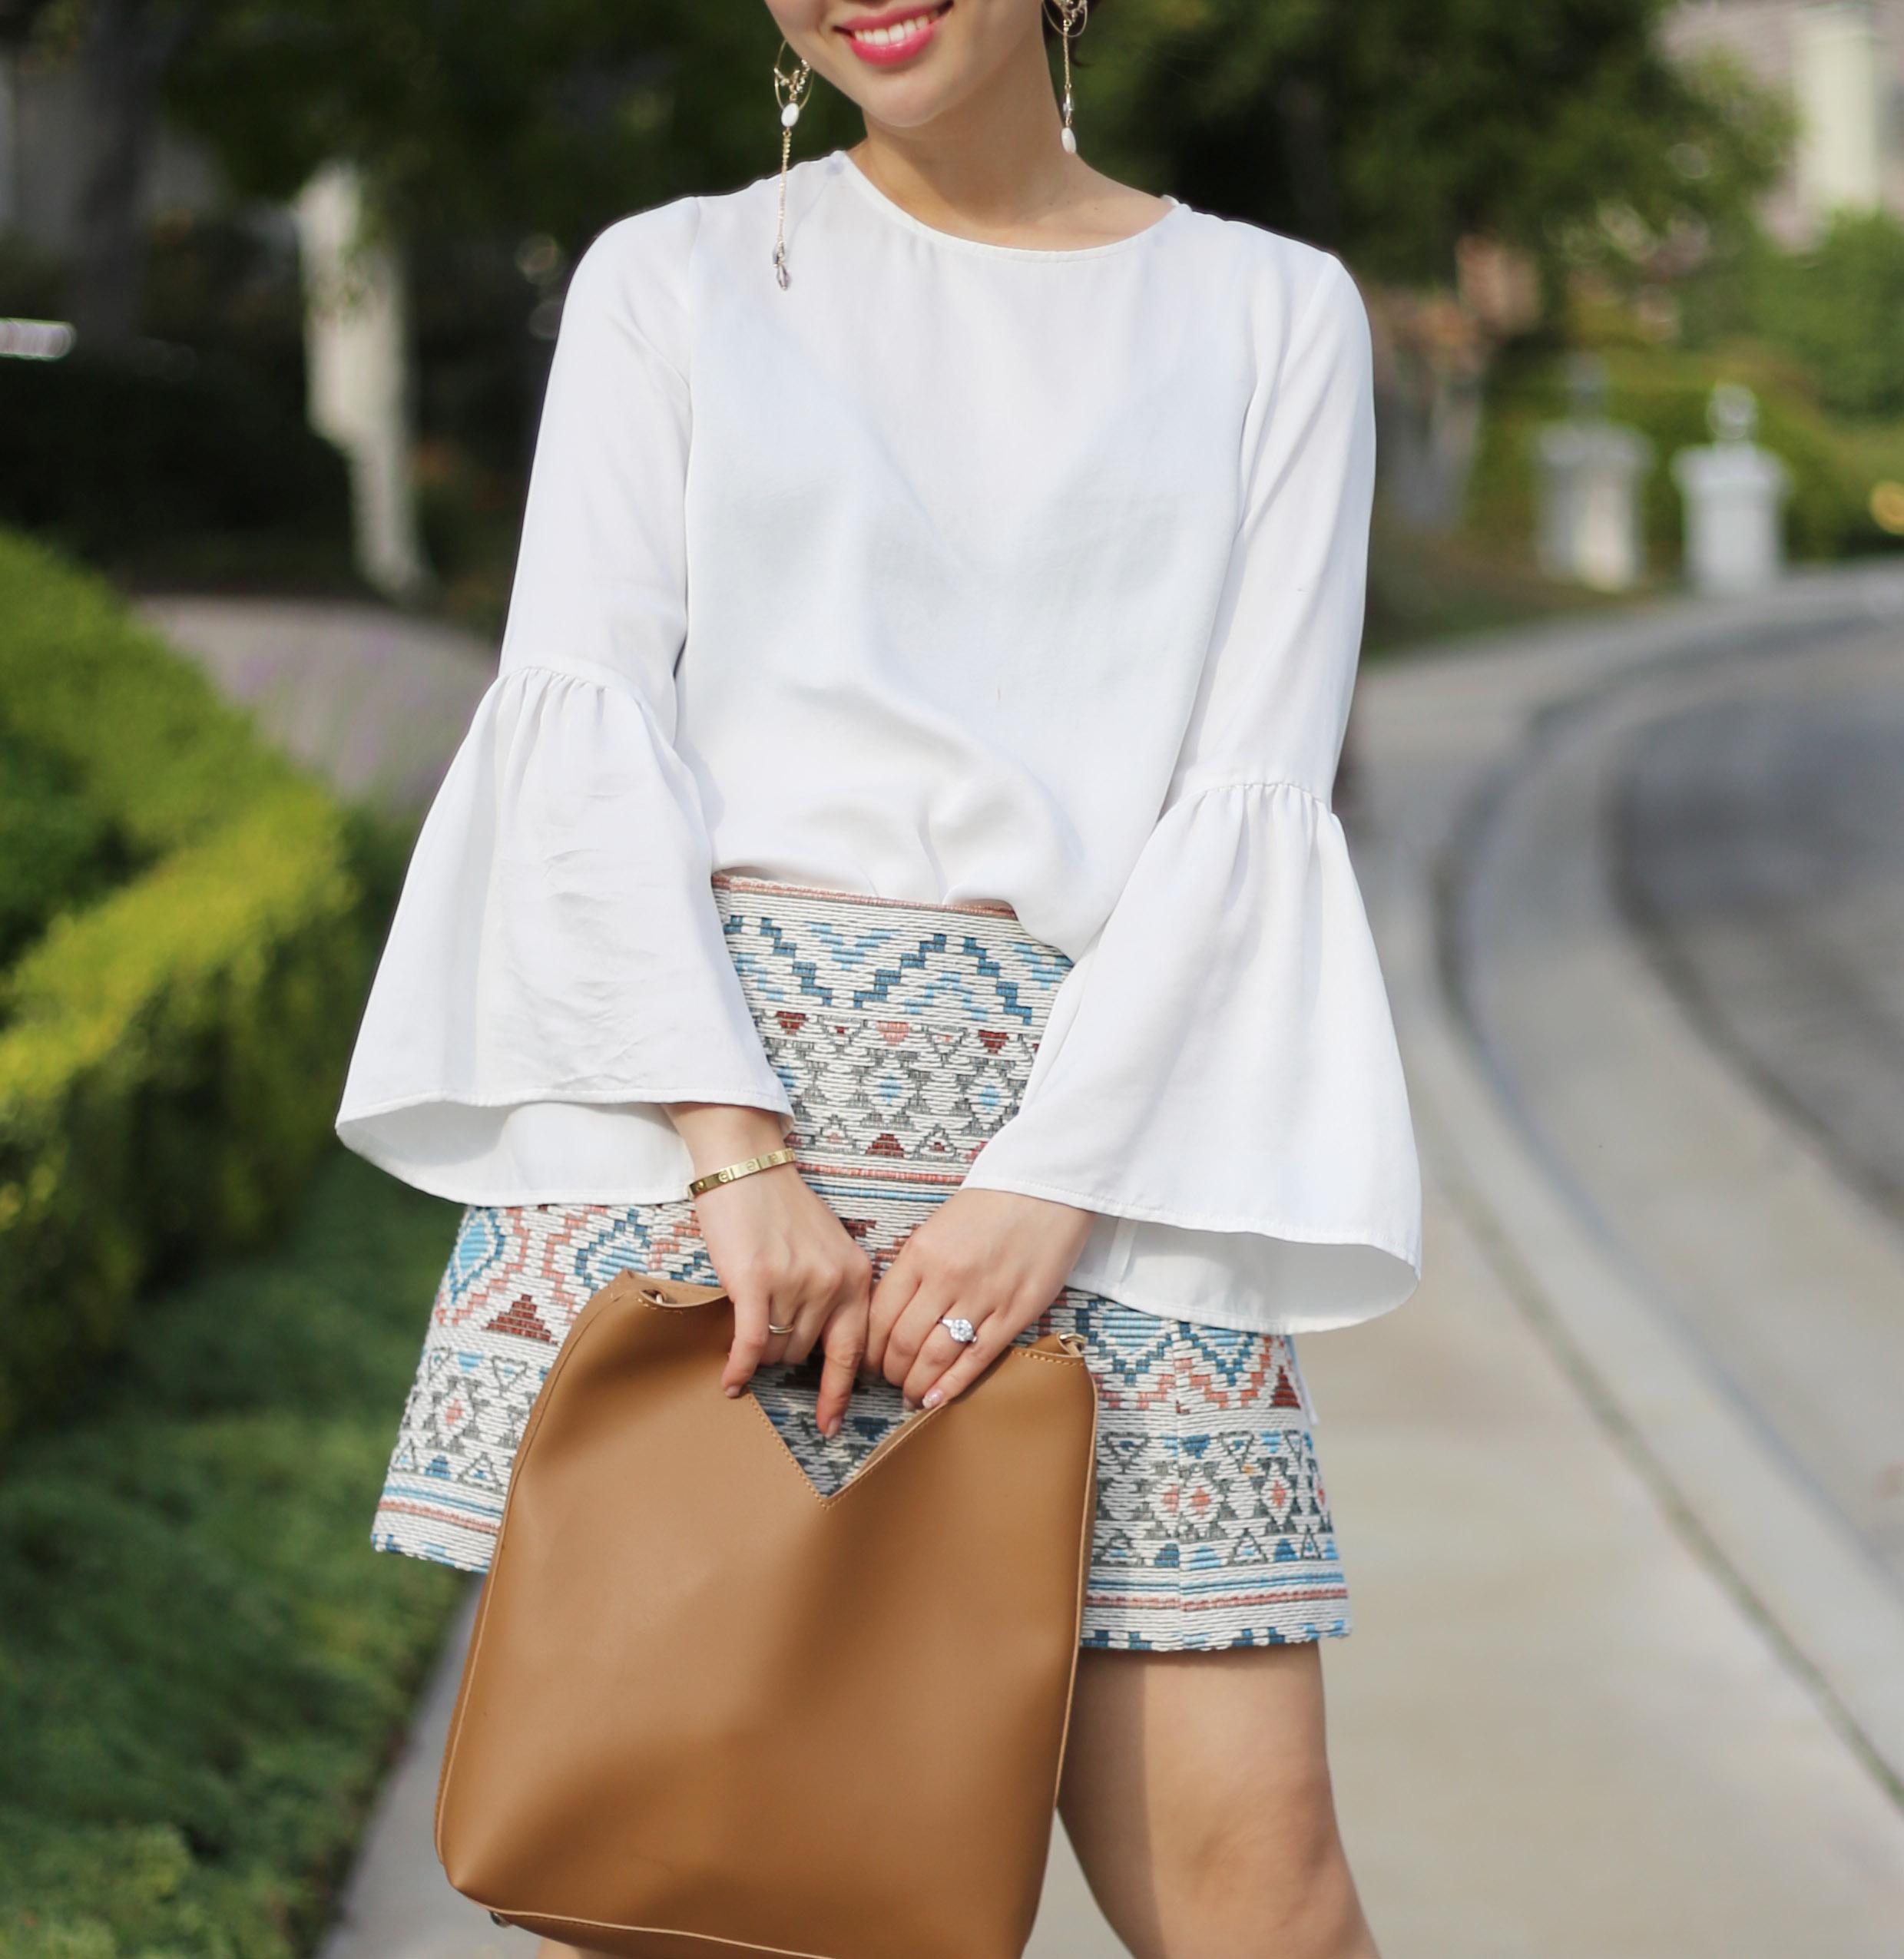 fashion blogger style.JPG